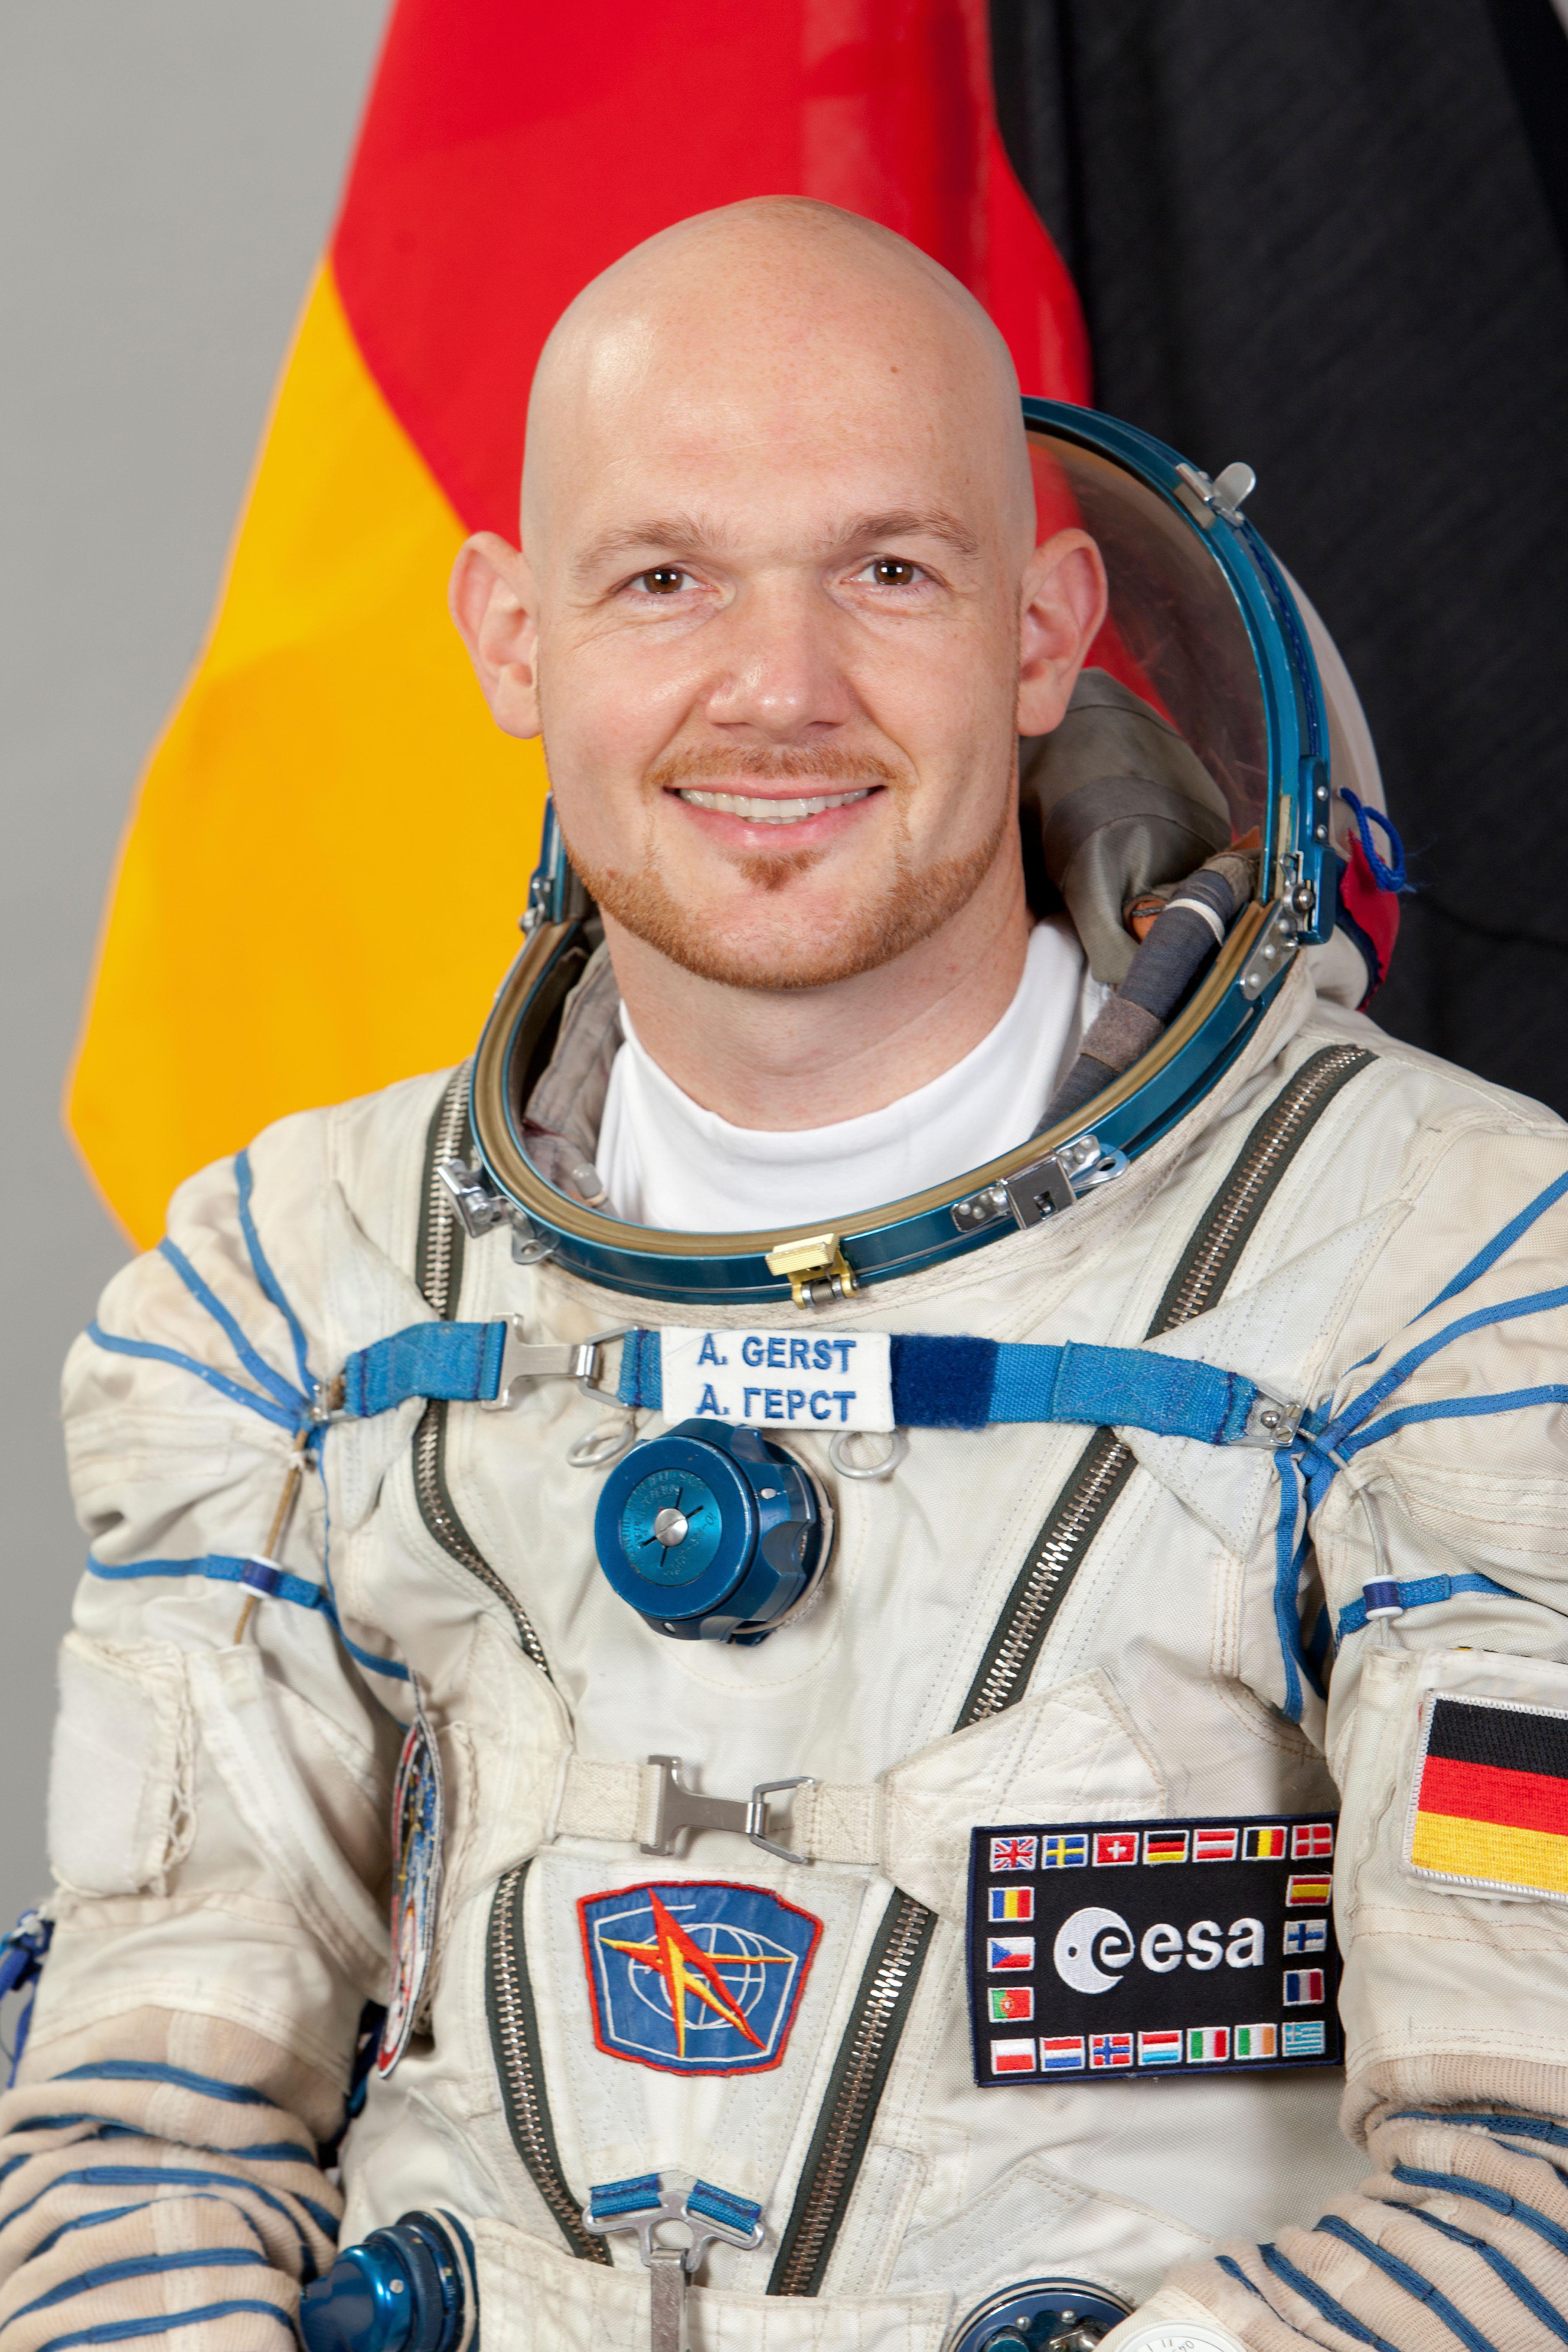 european space agency astronaut jobs - photo #5